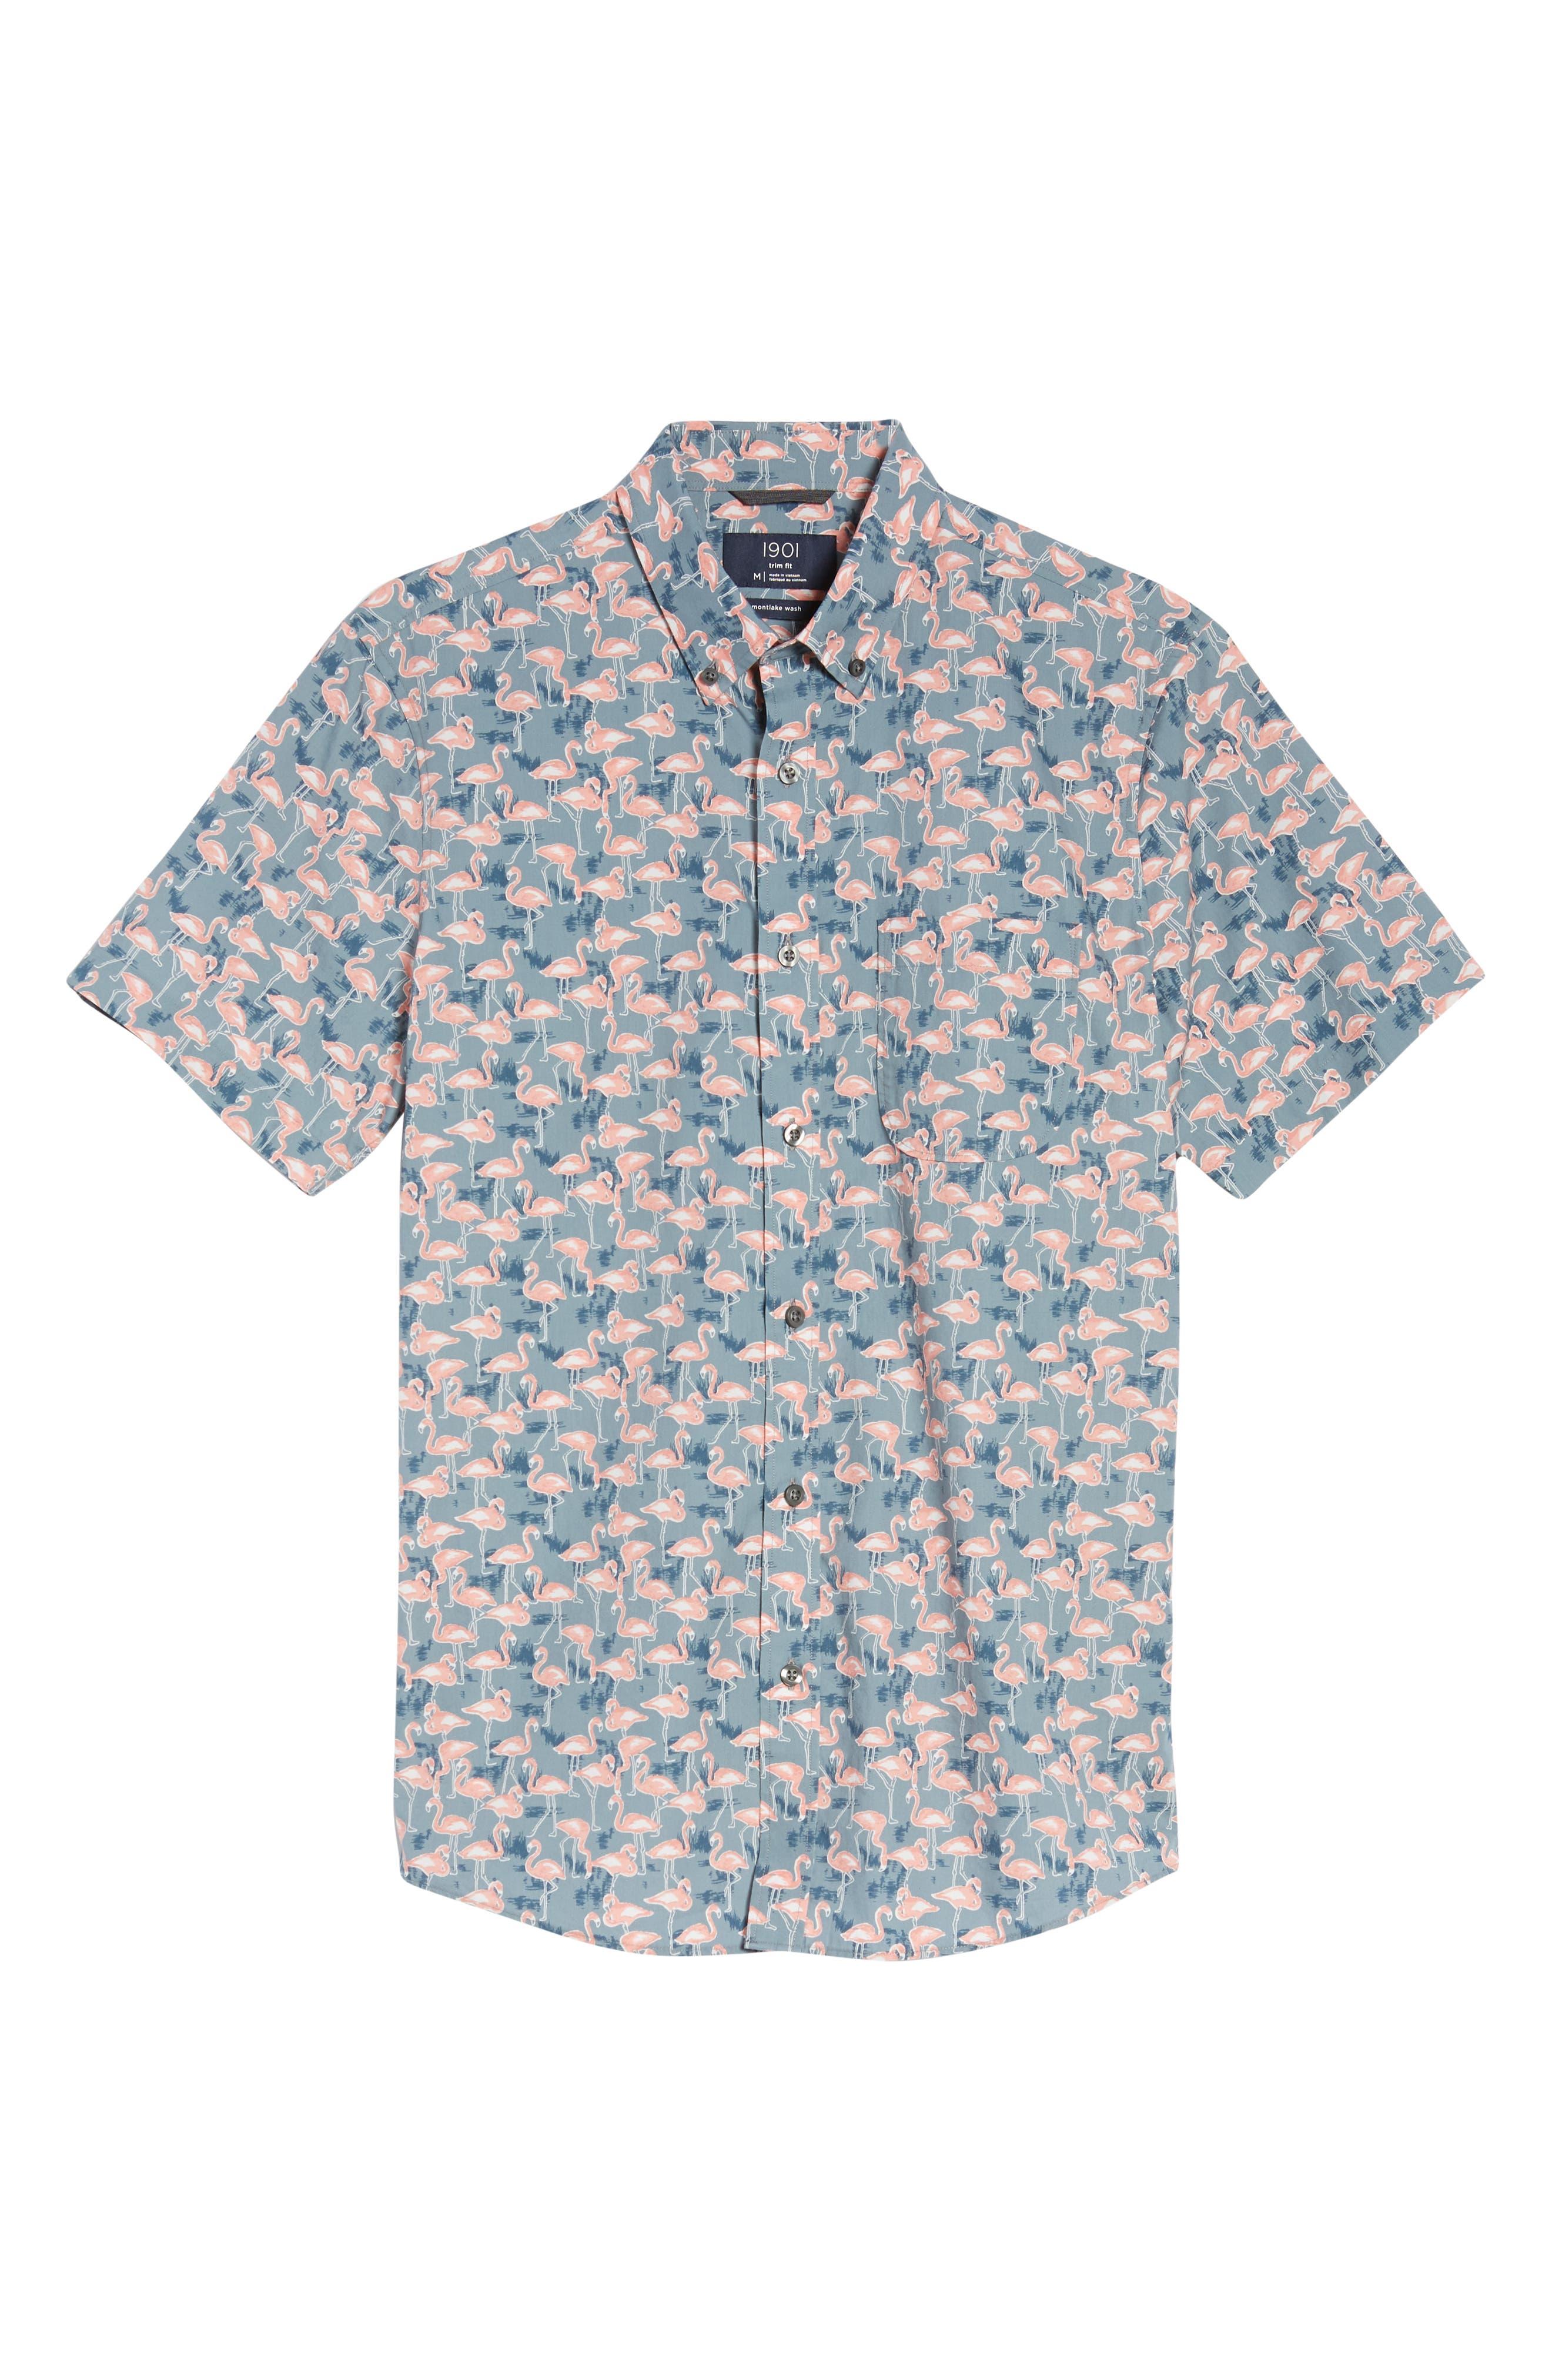 Trim Fit Print Short Sleeve Sport Shirt,                             Alternate thumbnail 6, color,                             GREY GRISALLE PINK FLAMINGOS